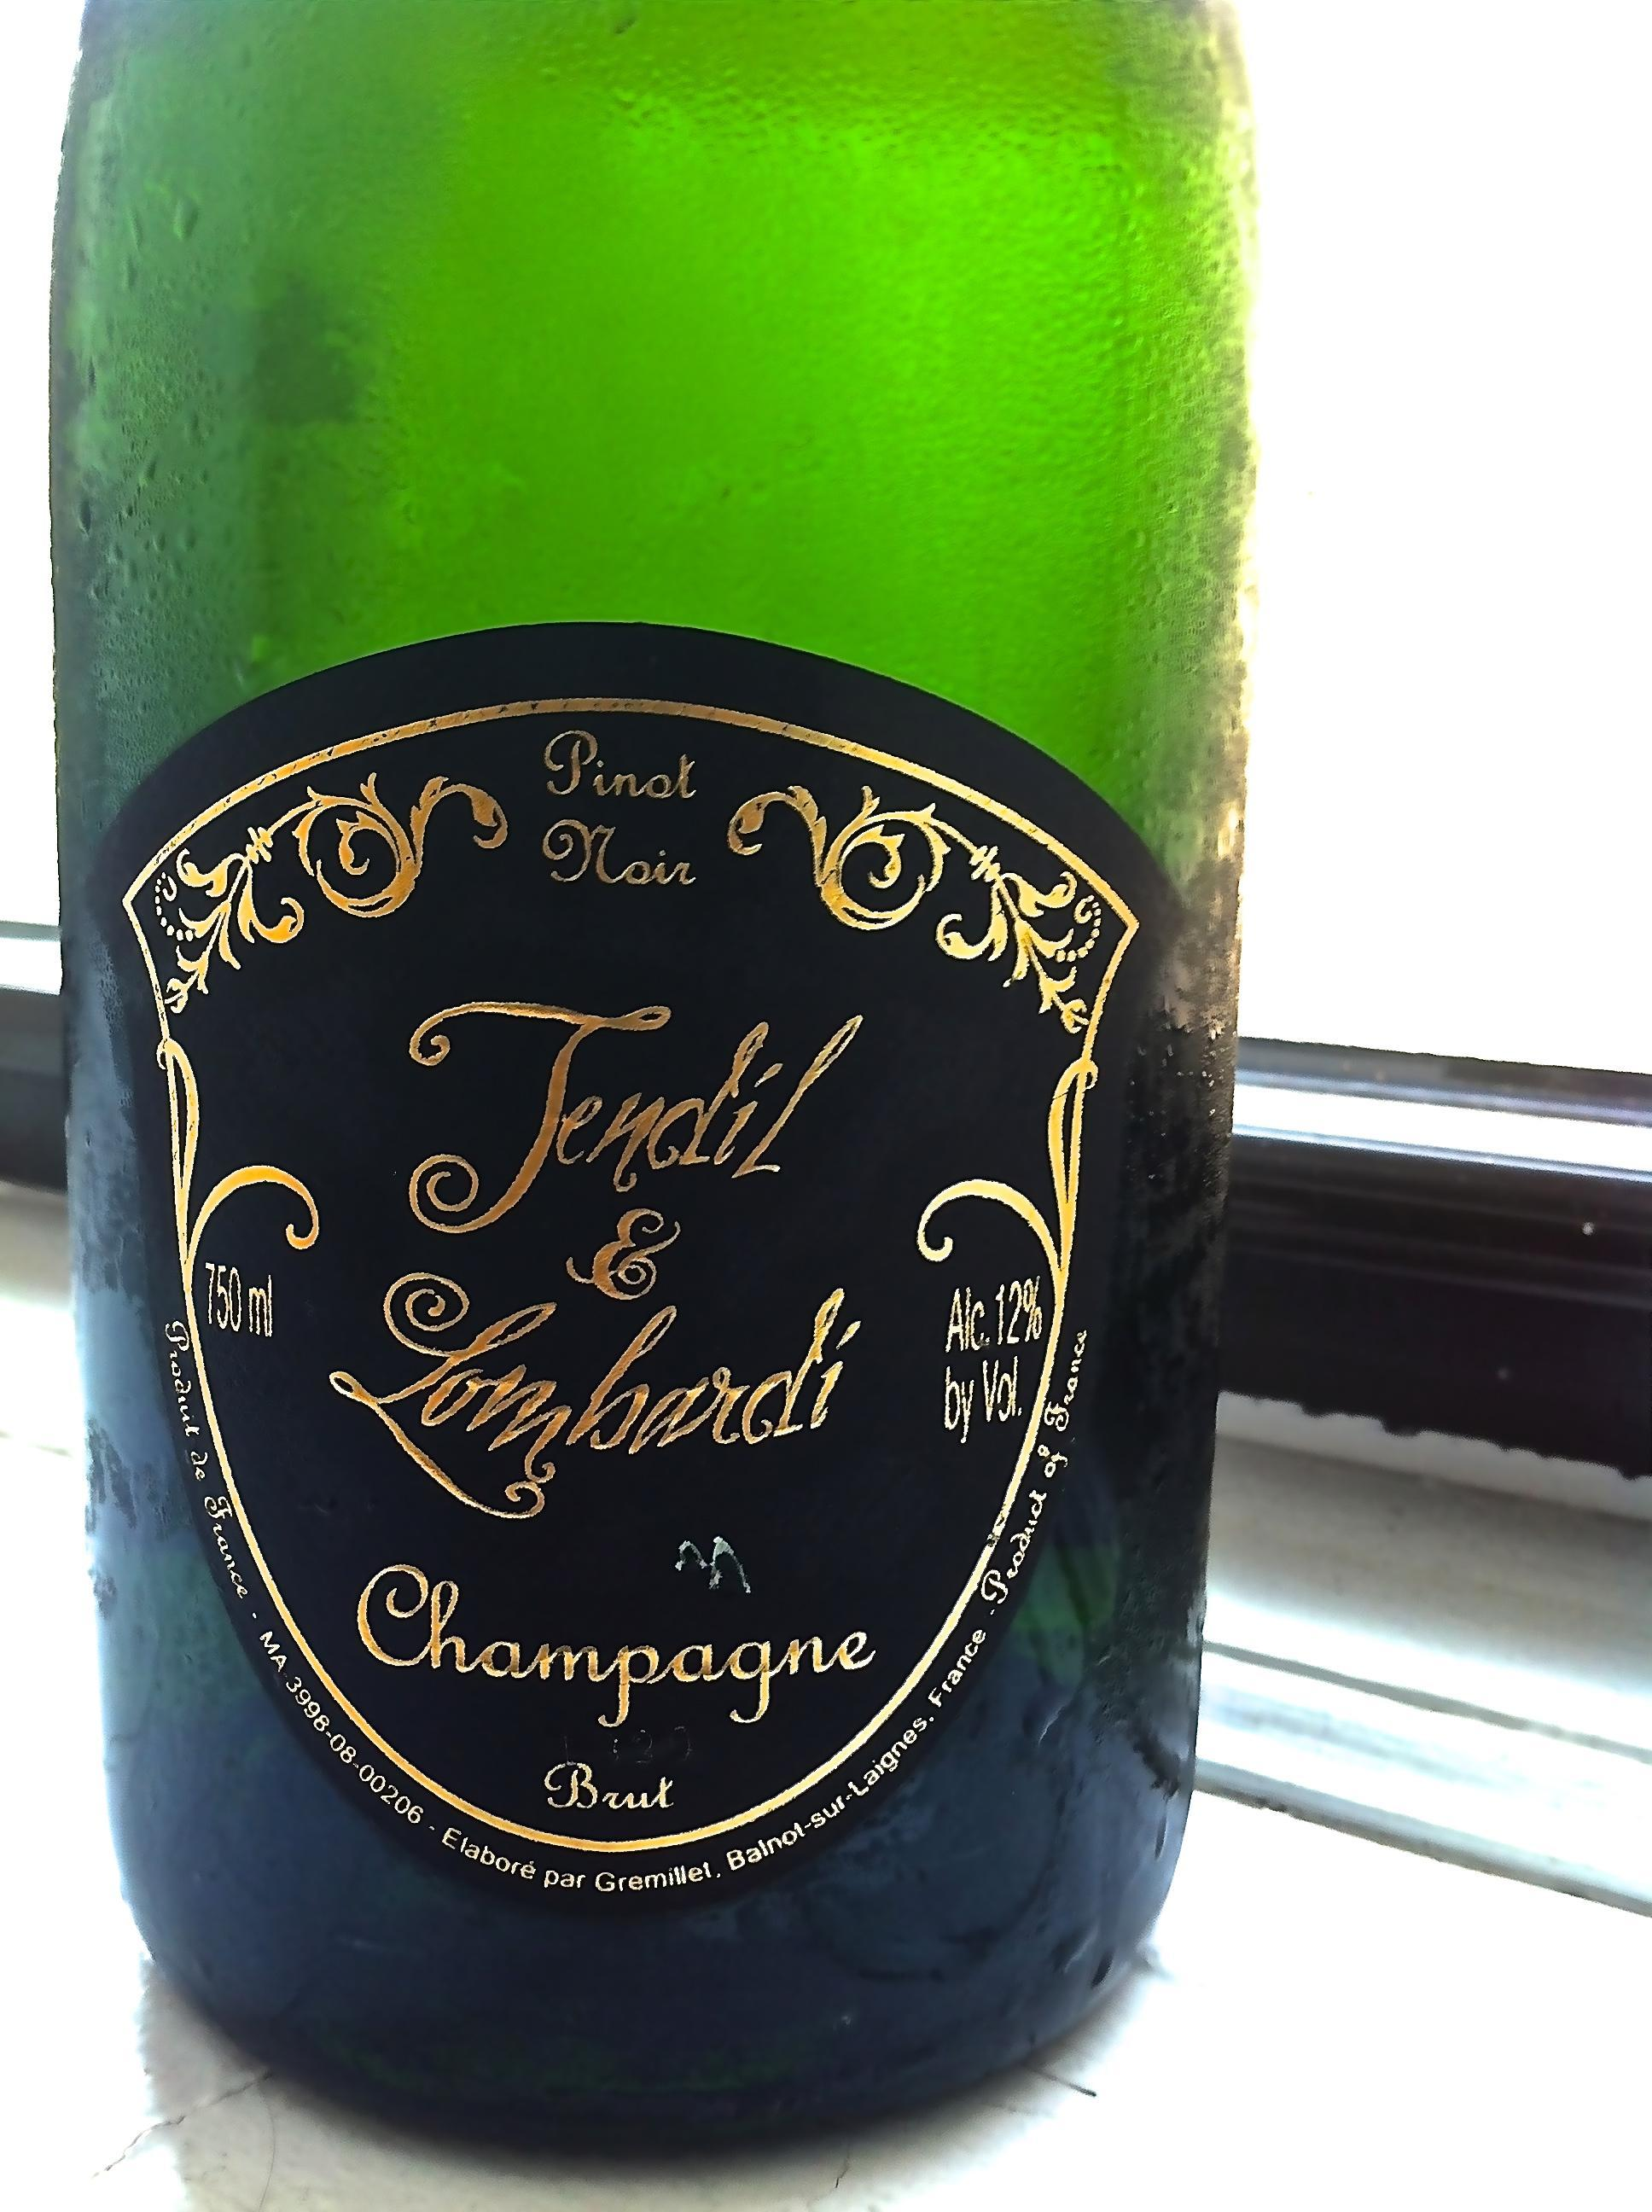 Tendil & Lombardi, Blanc de Noir, Champagne, France 6